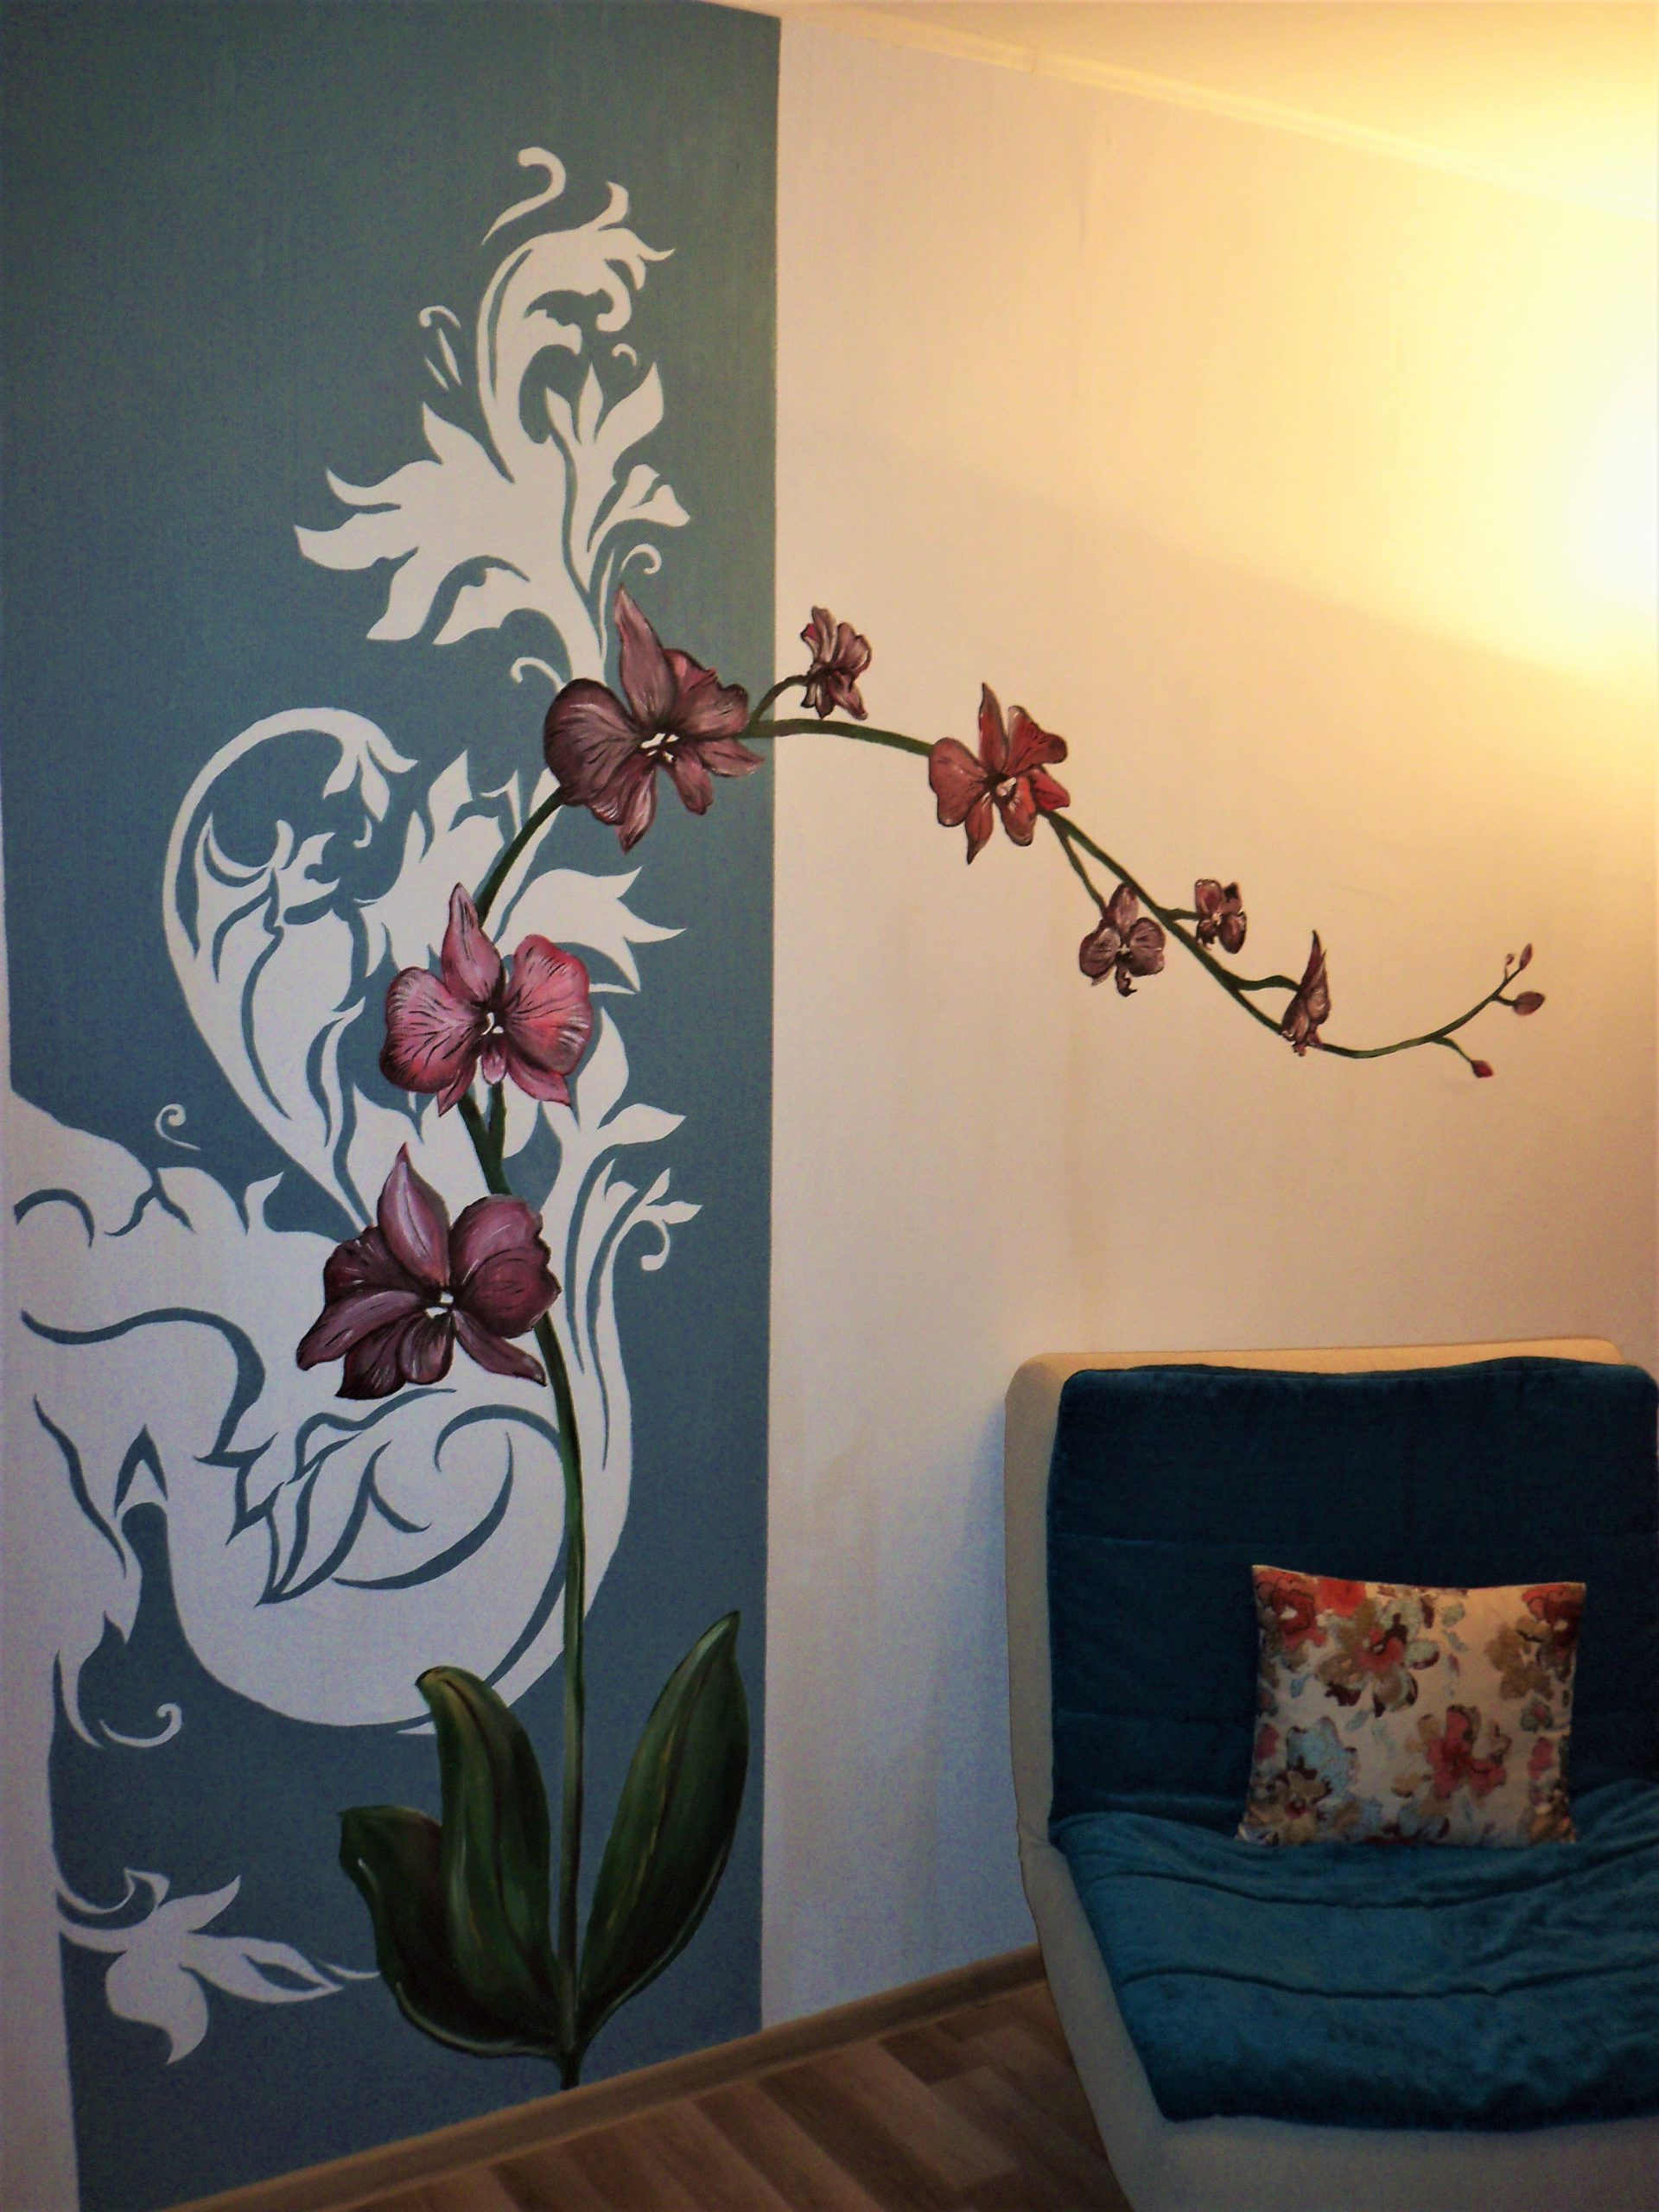 menine-kuryba-sienu-dekoravimas-ivairus-interjerai (39)